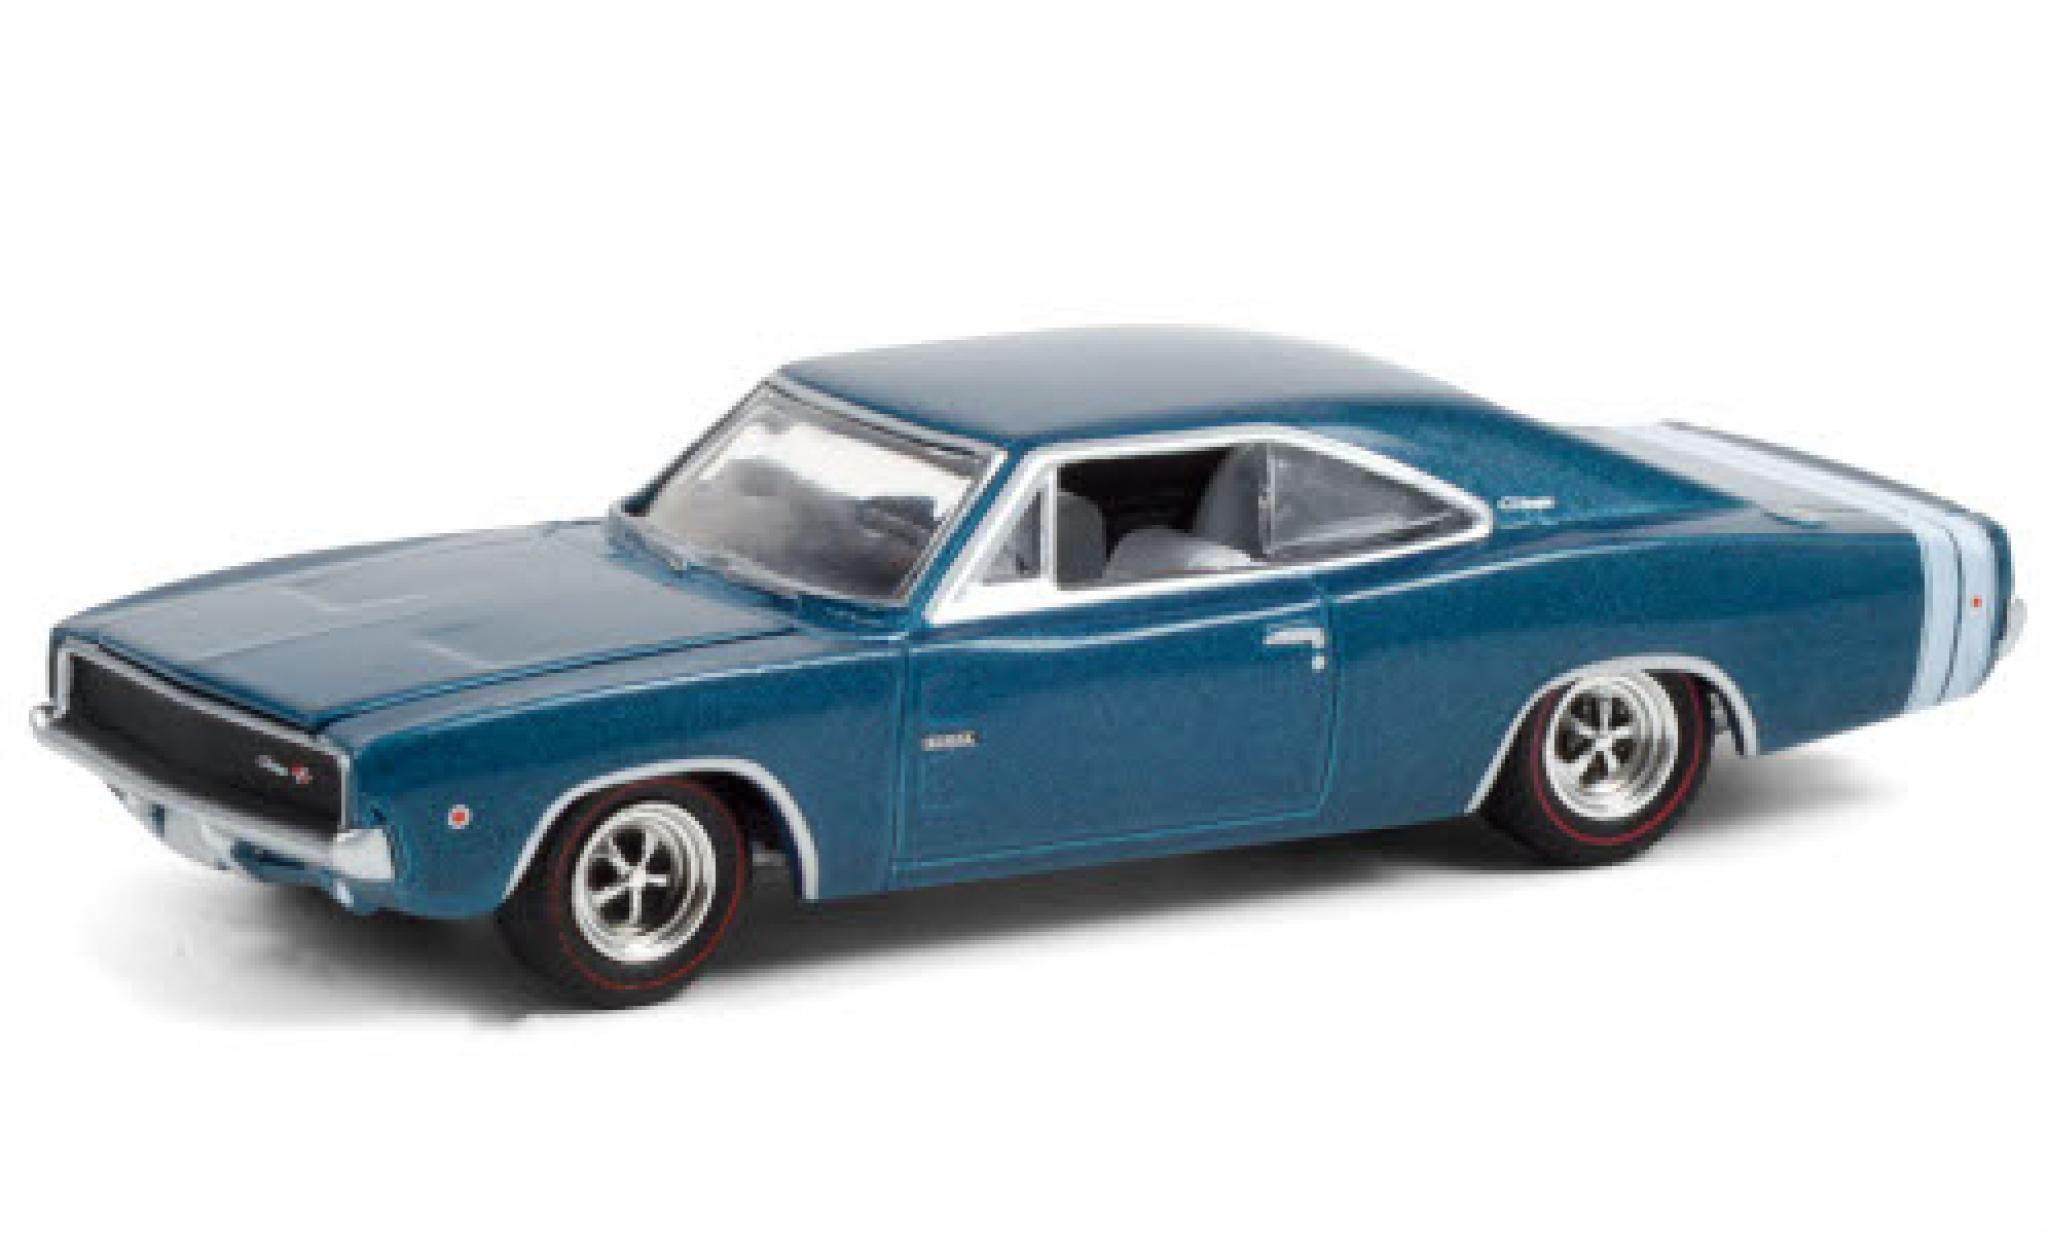 Dodge Charger 1/64 Greenlight R/T HEMI metallise blue/white 1968 426 HEMI 50 Years